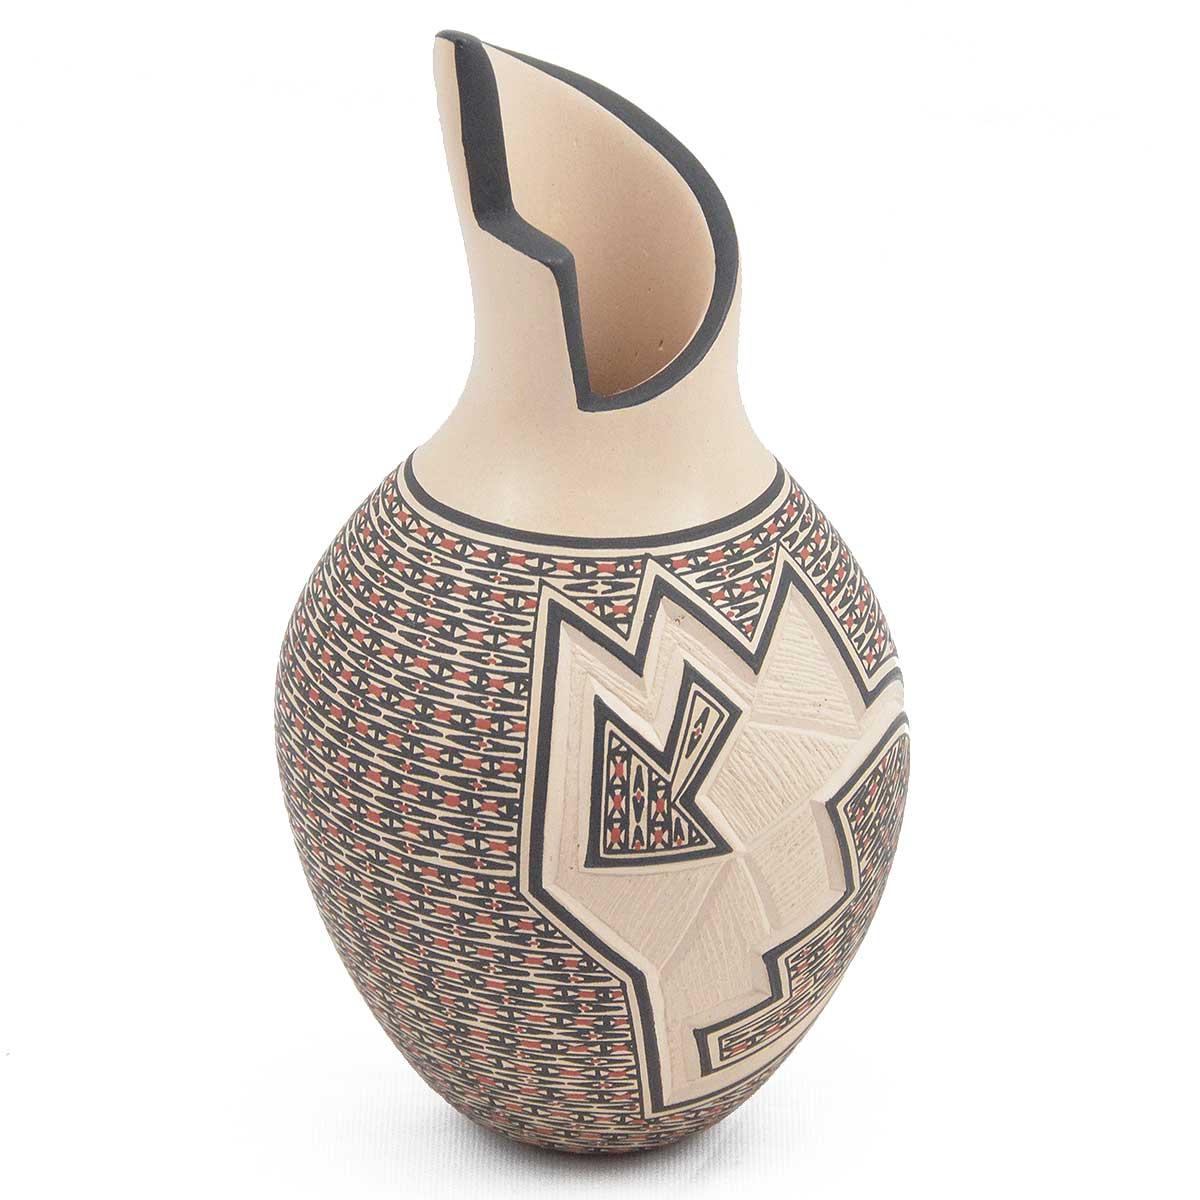 Karla Lopez Karla Lopez: Small Tall Neck Vase Etched